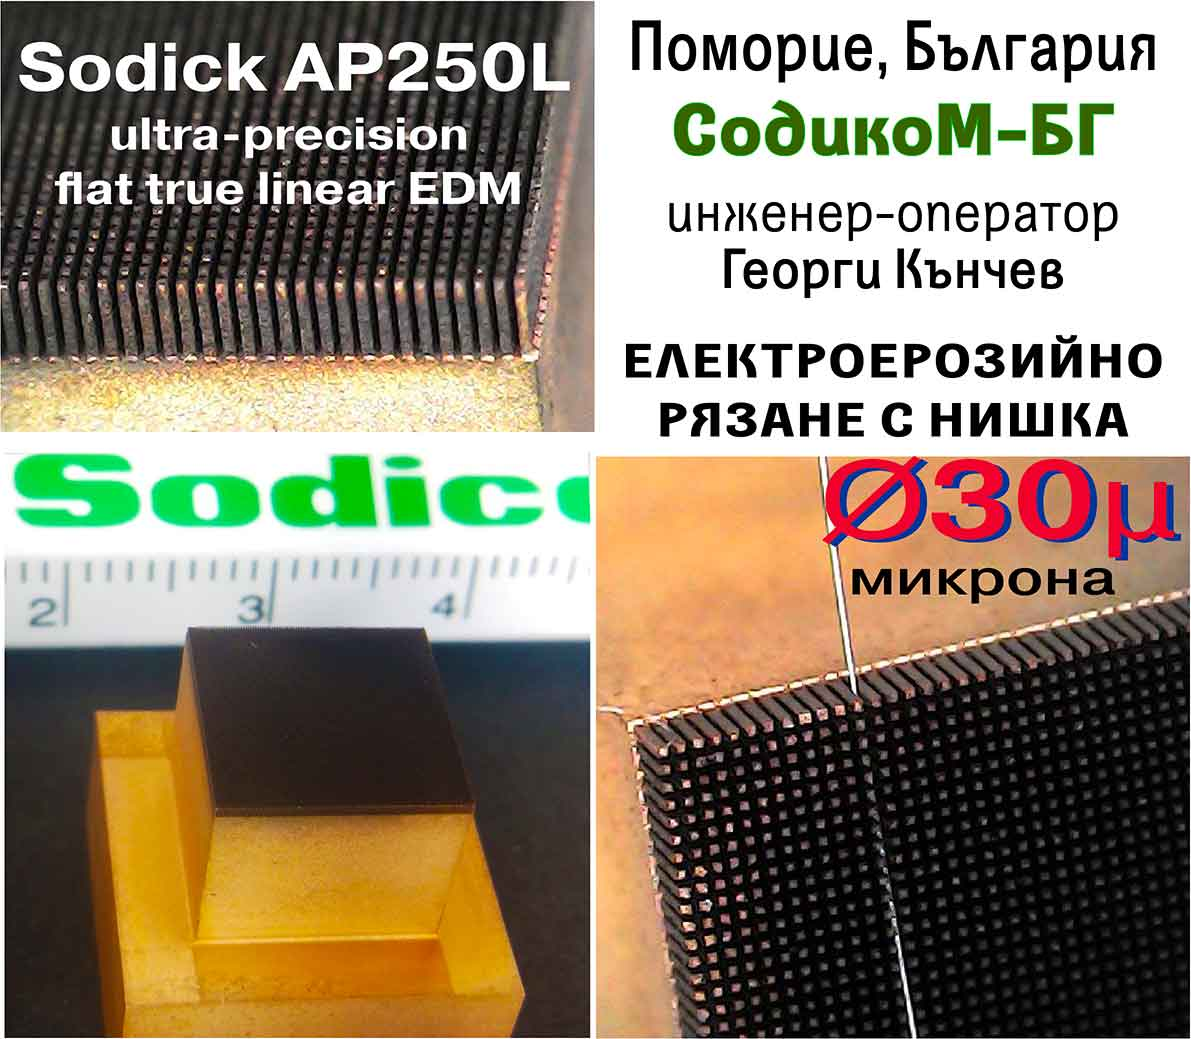 Sodick AP250L 30 micron wire-cutting